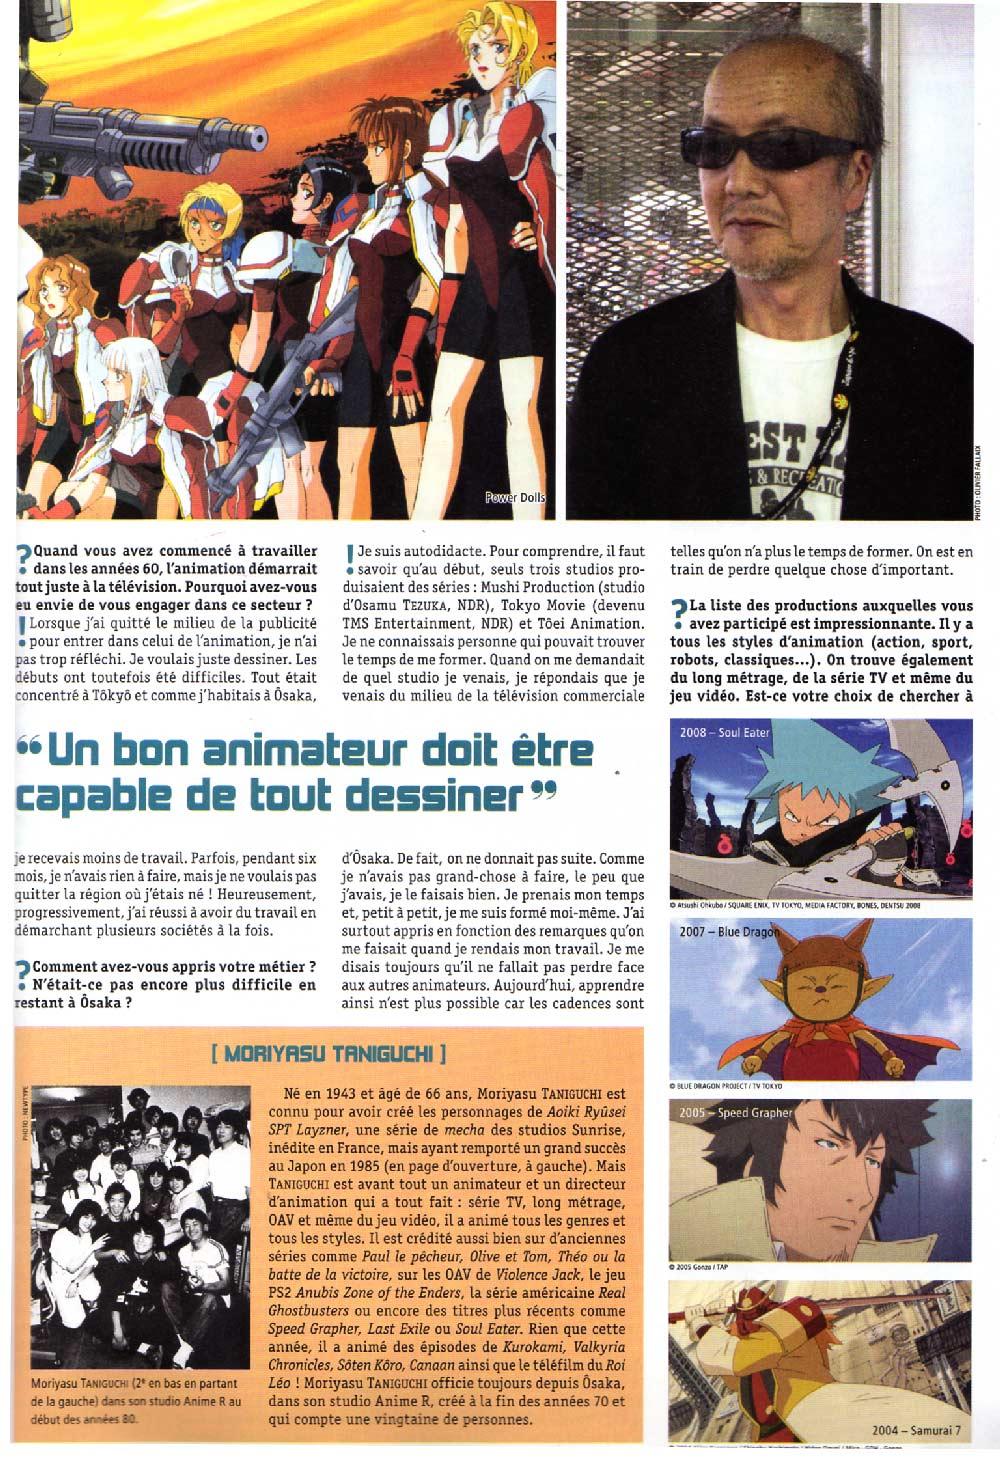 Animeland 157 page 27, interview de Moriyasu Taniguchi